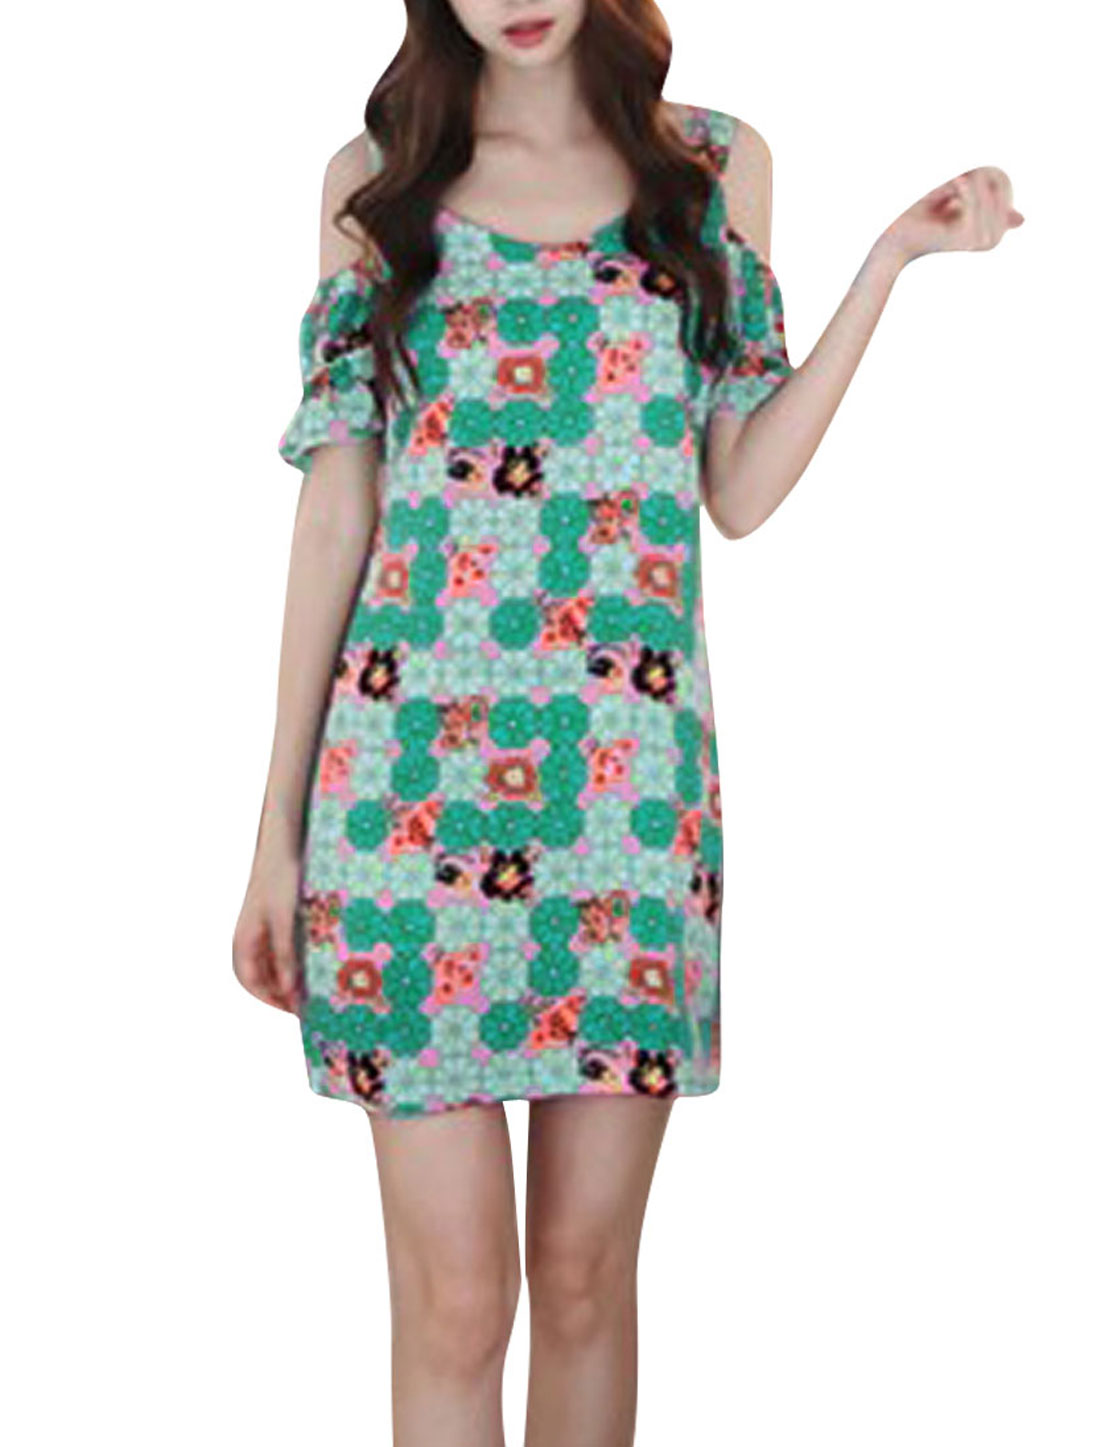 Women Short Sleeves Chiffon Floral Prints Casual Dress Light Green XS